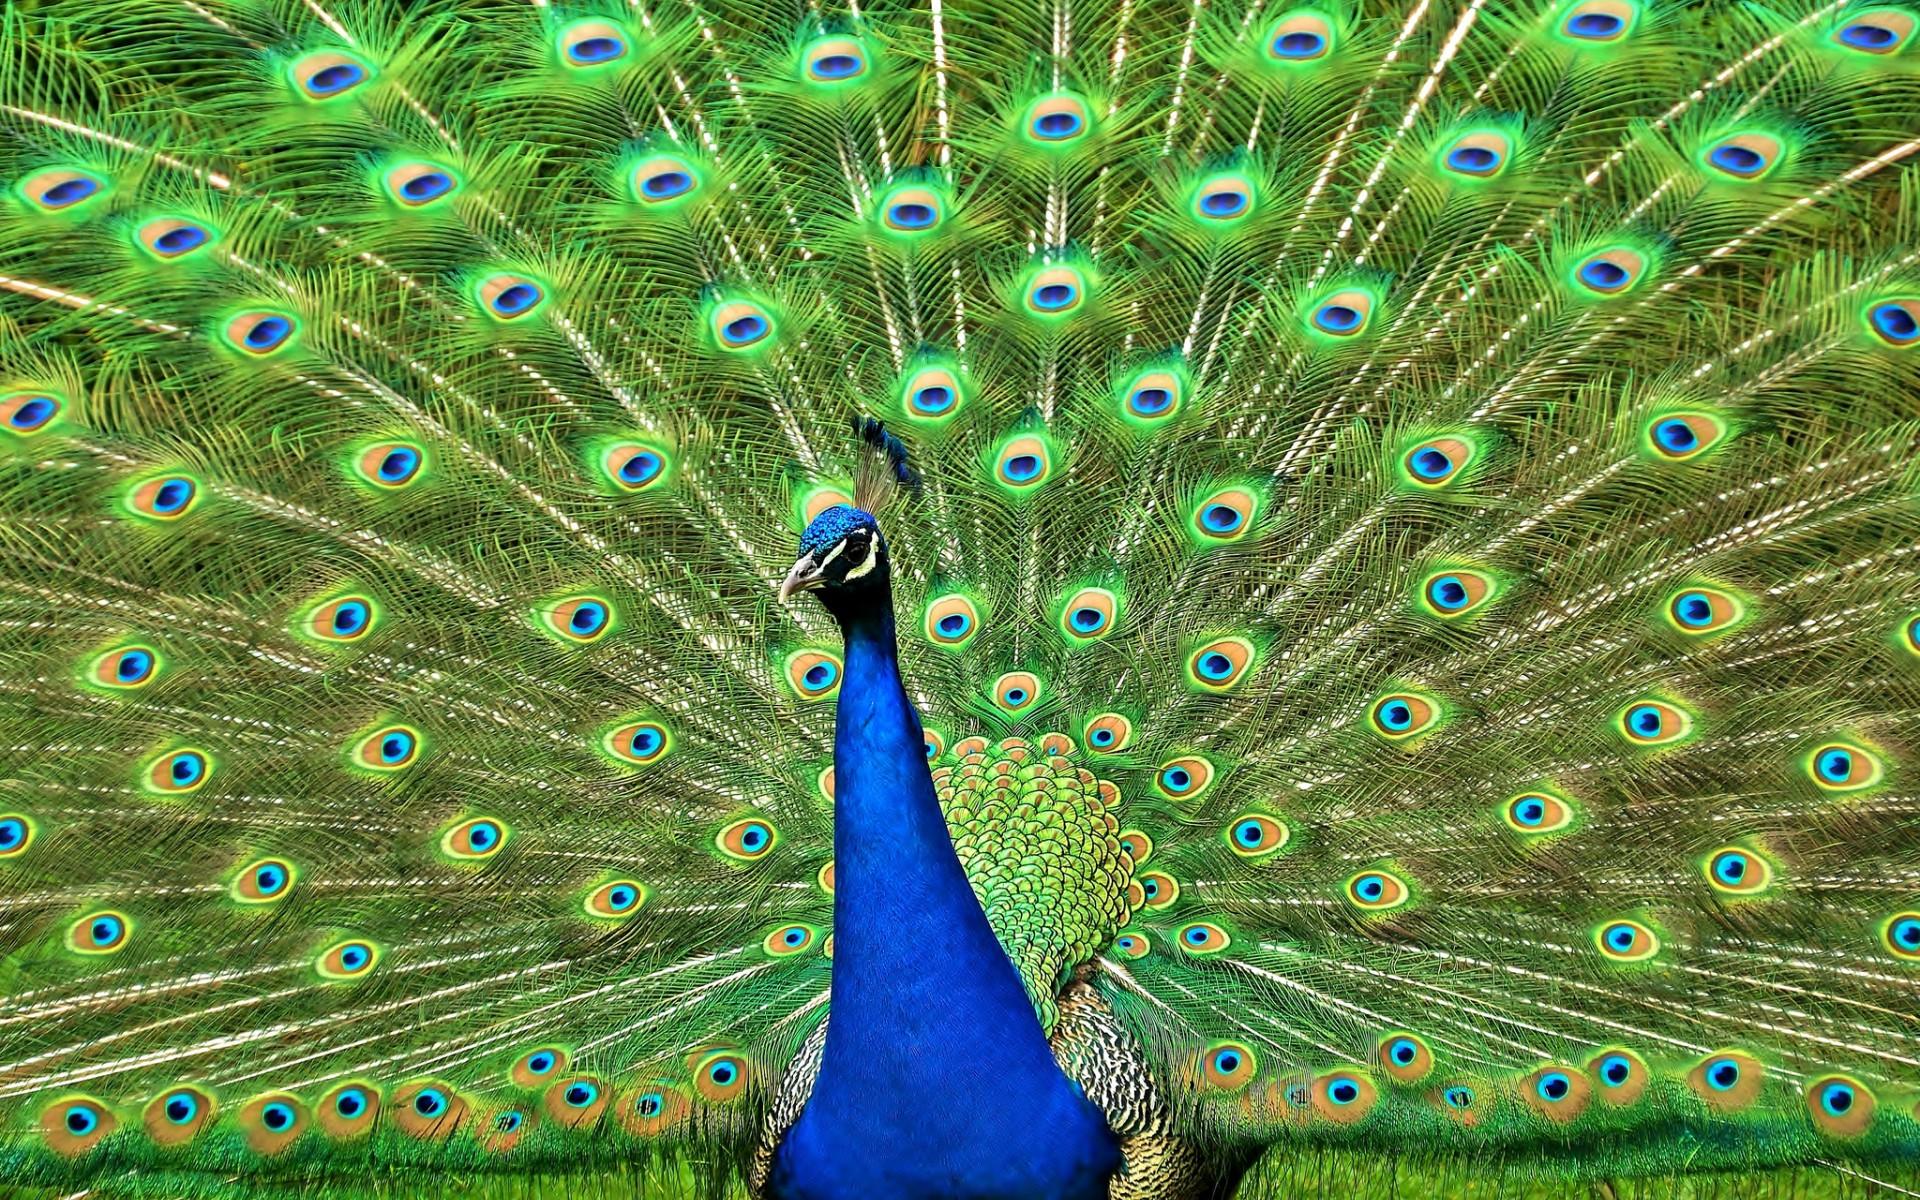 peacock bird pictures